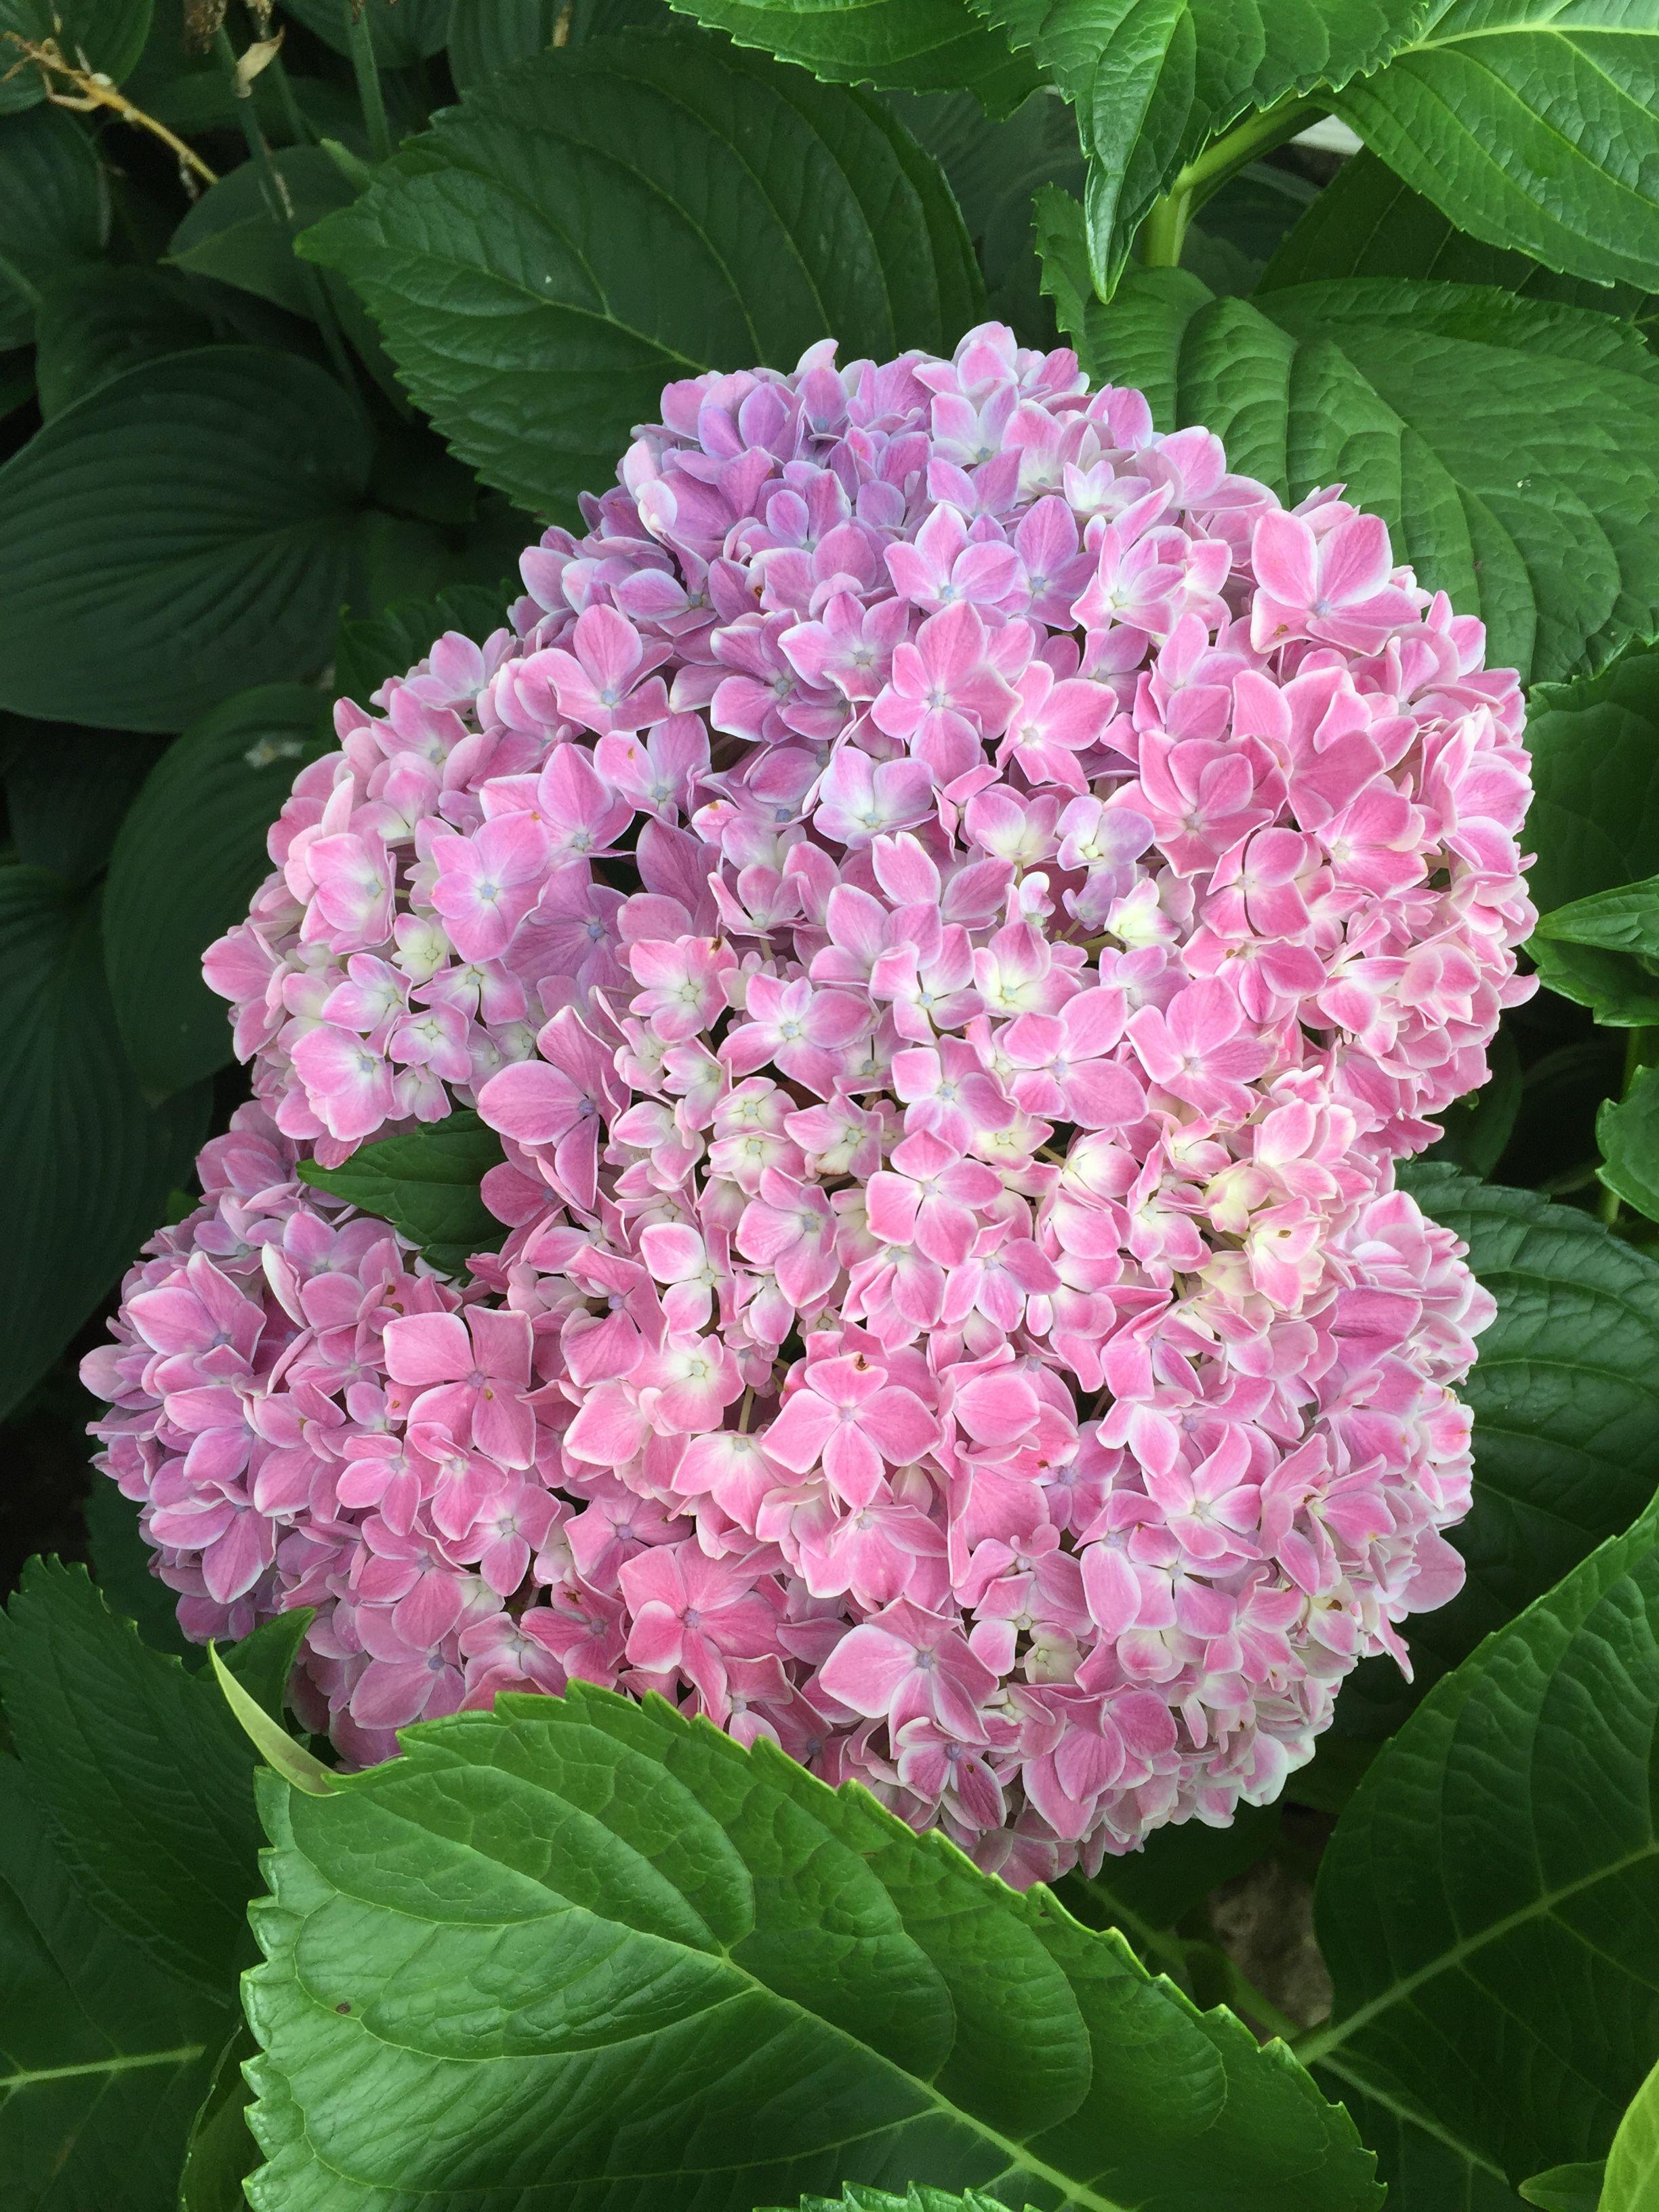 Pin by leslie bedene on plants u flowers pinterest